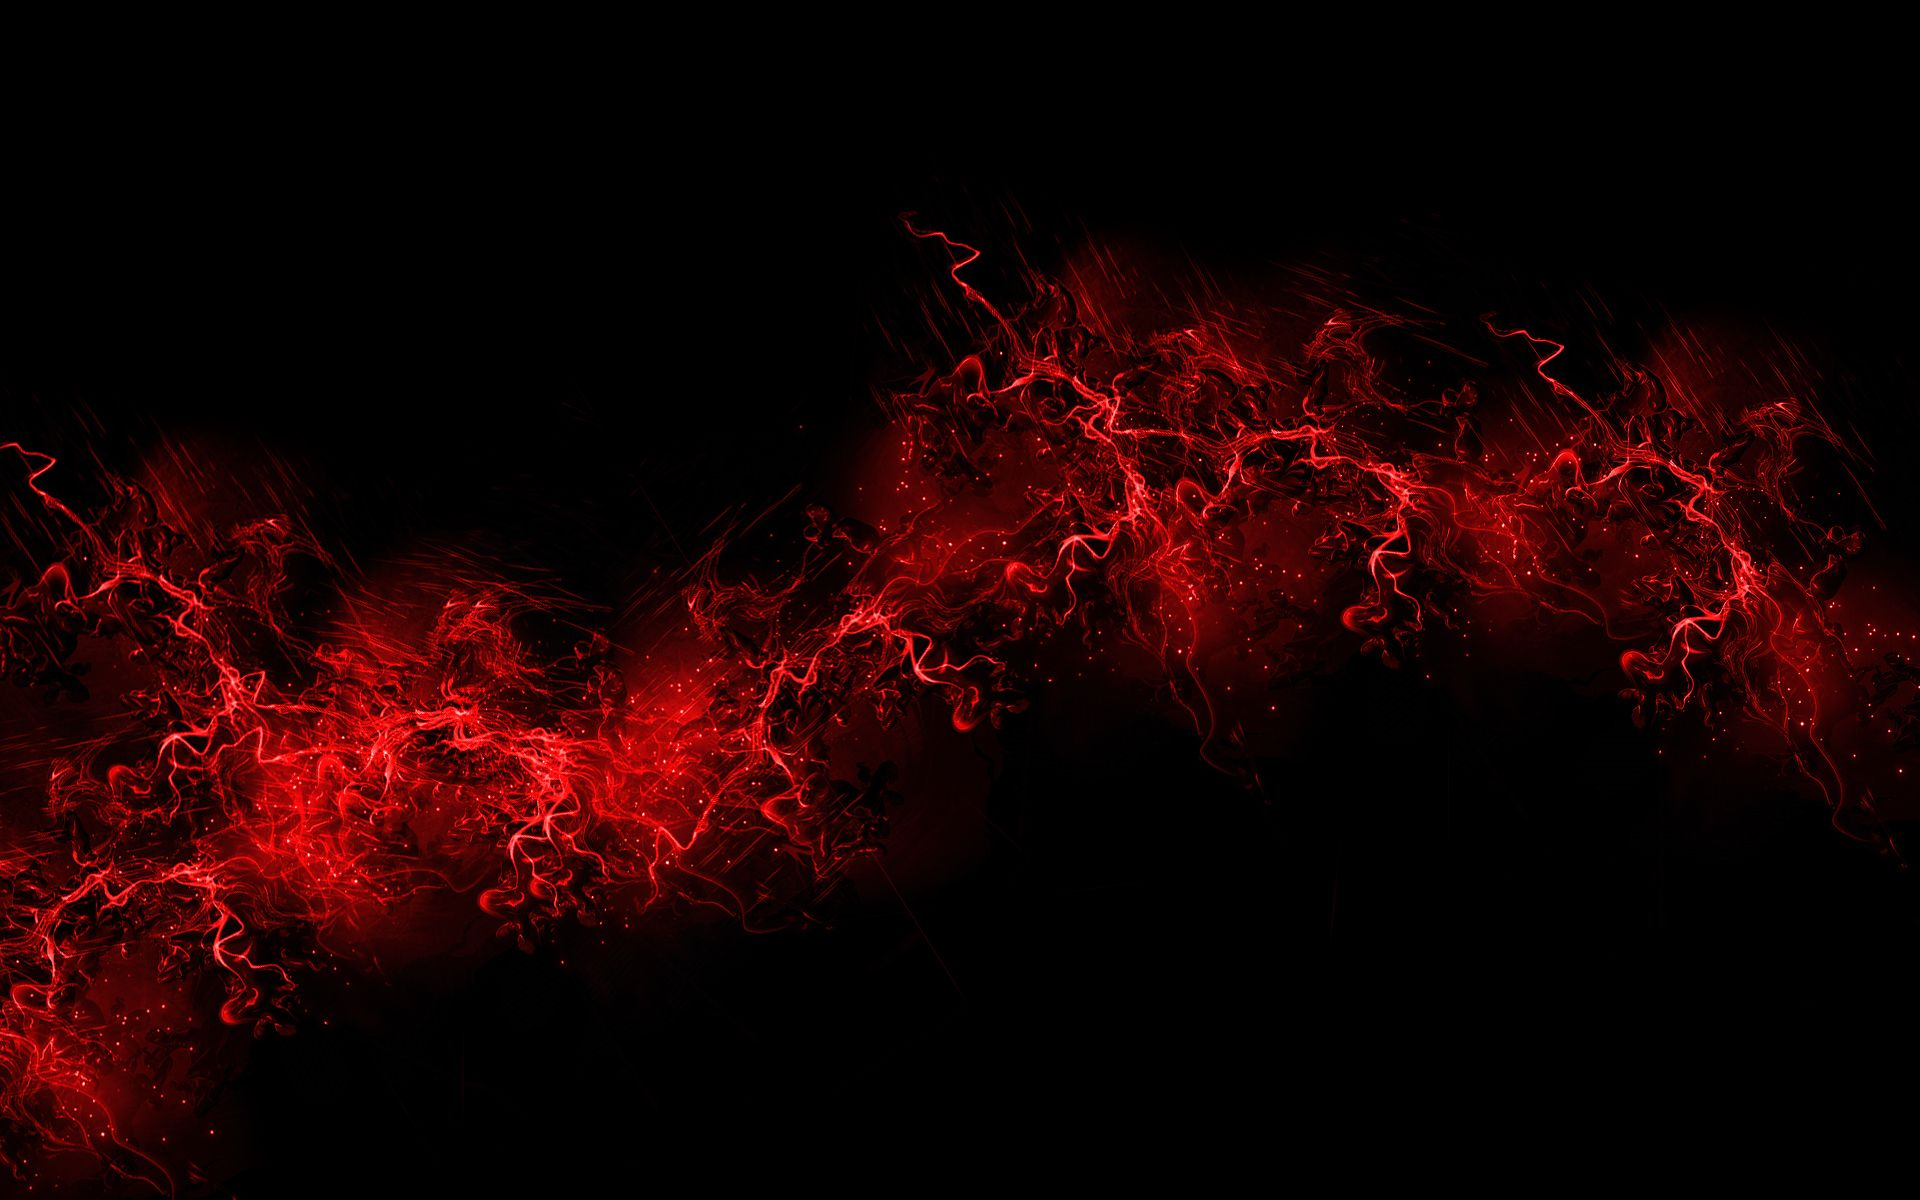 Wallpaper Red Black Dark